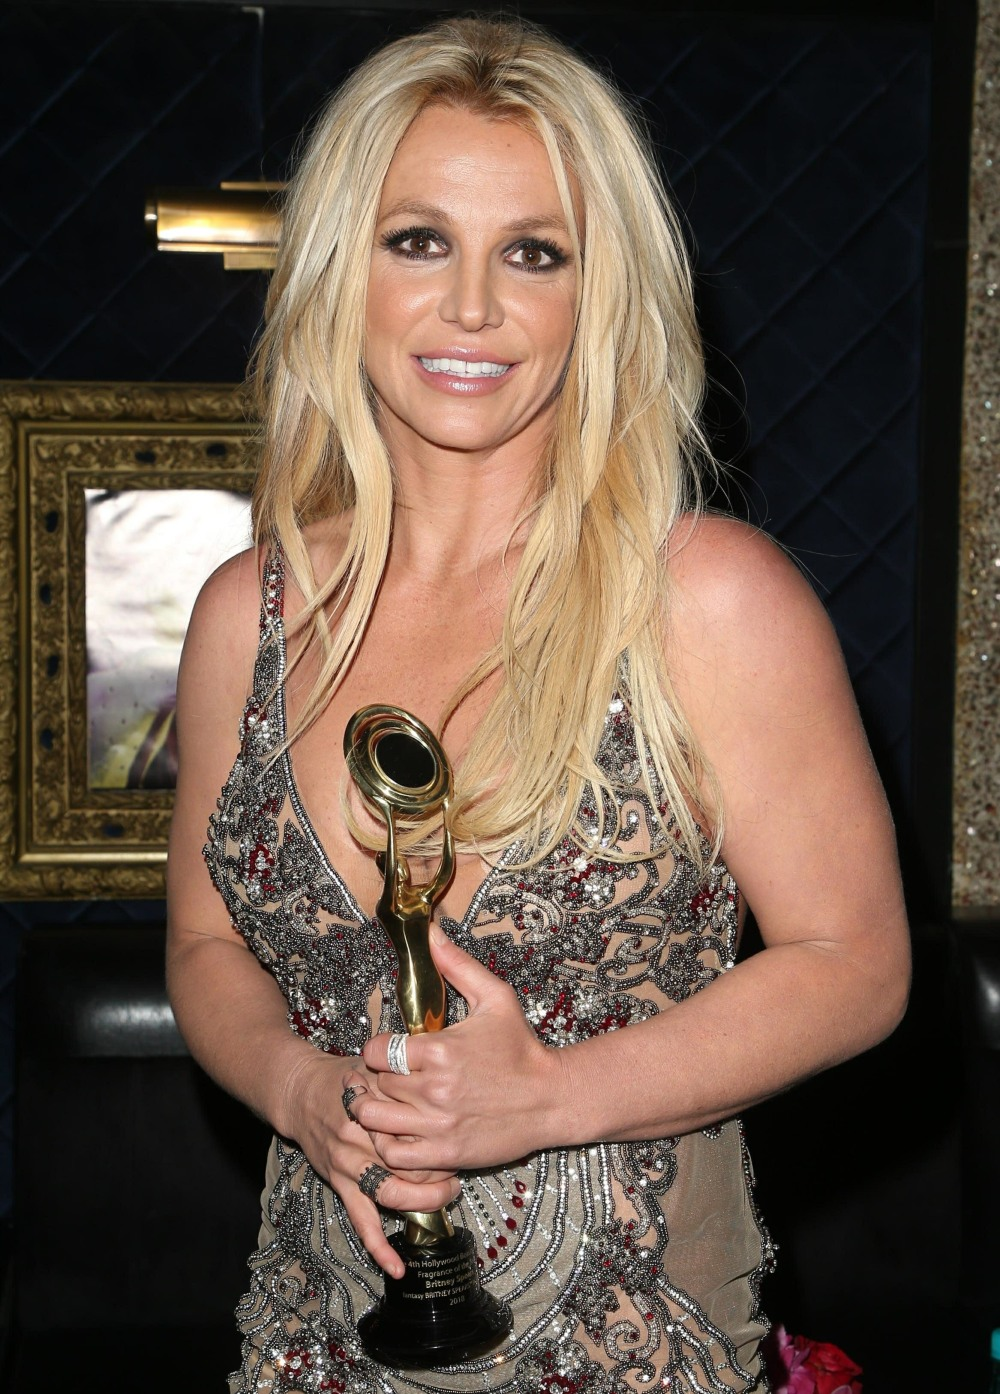 I 4 premi annuali di bellezza di Hollywood